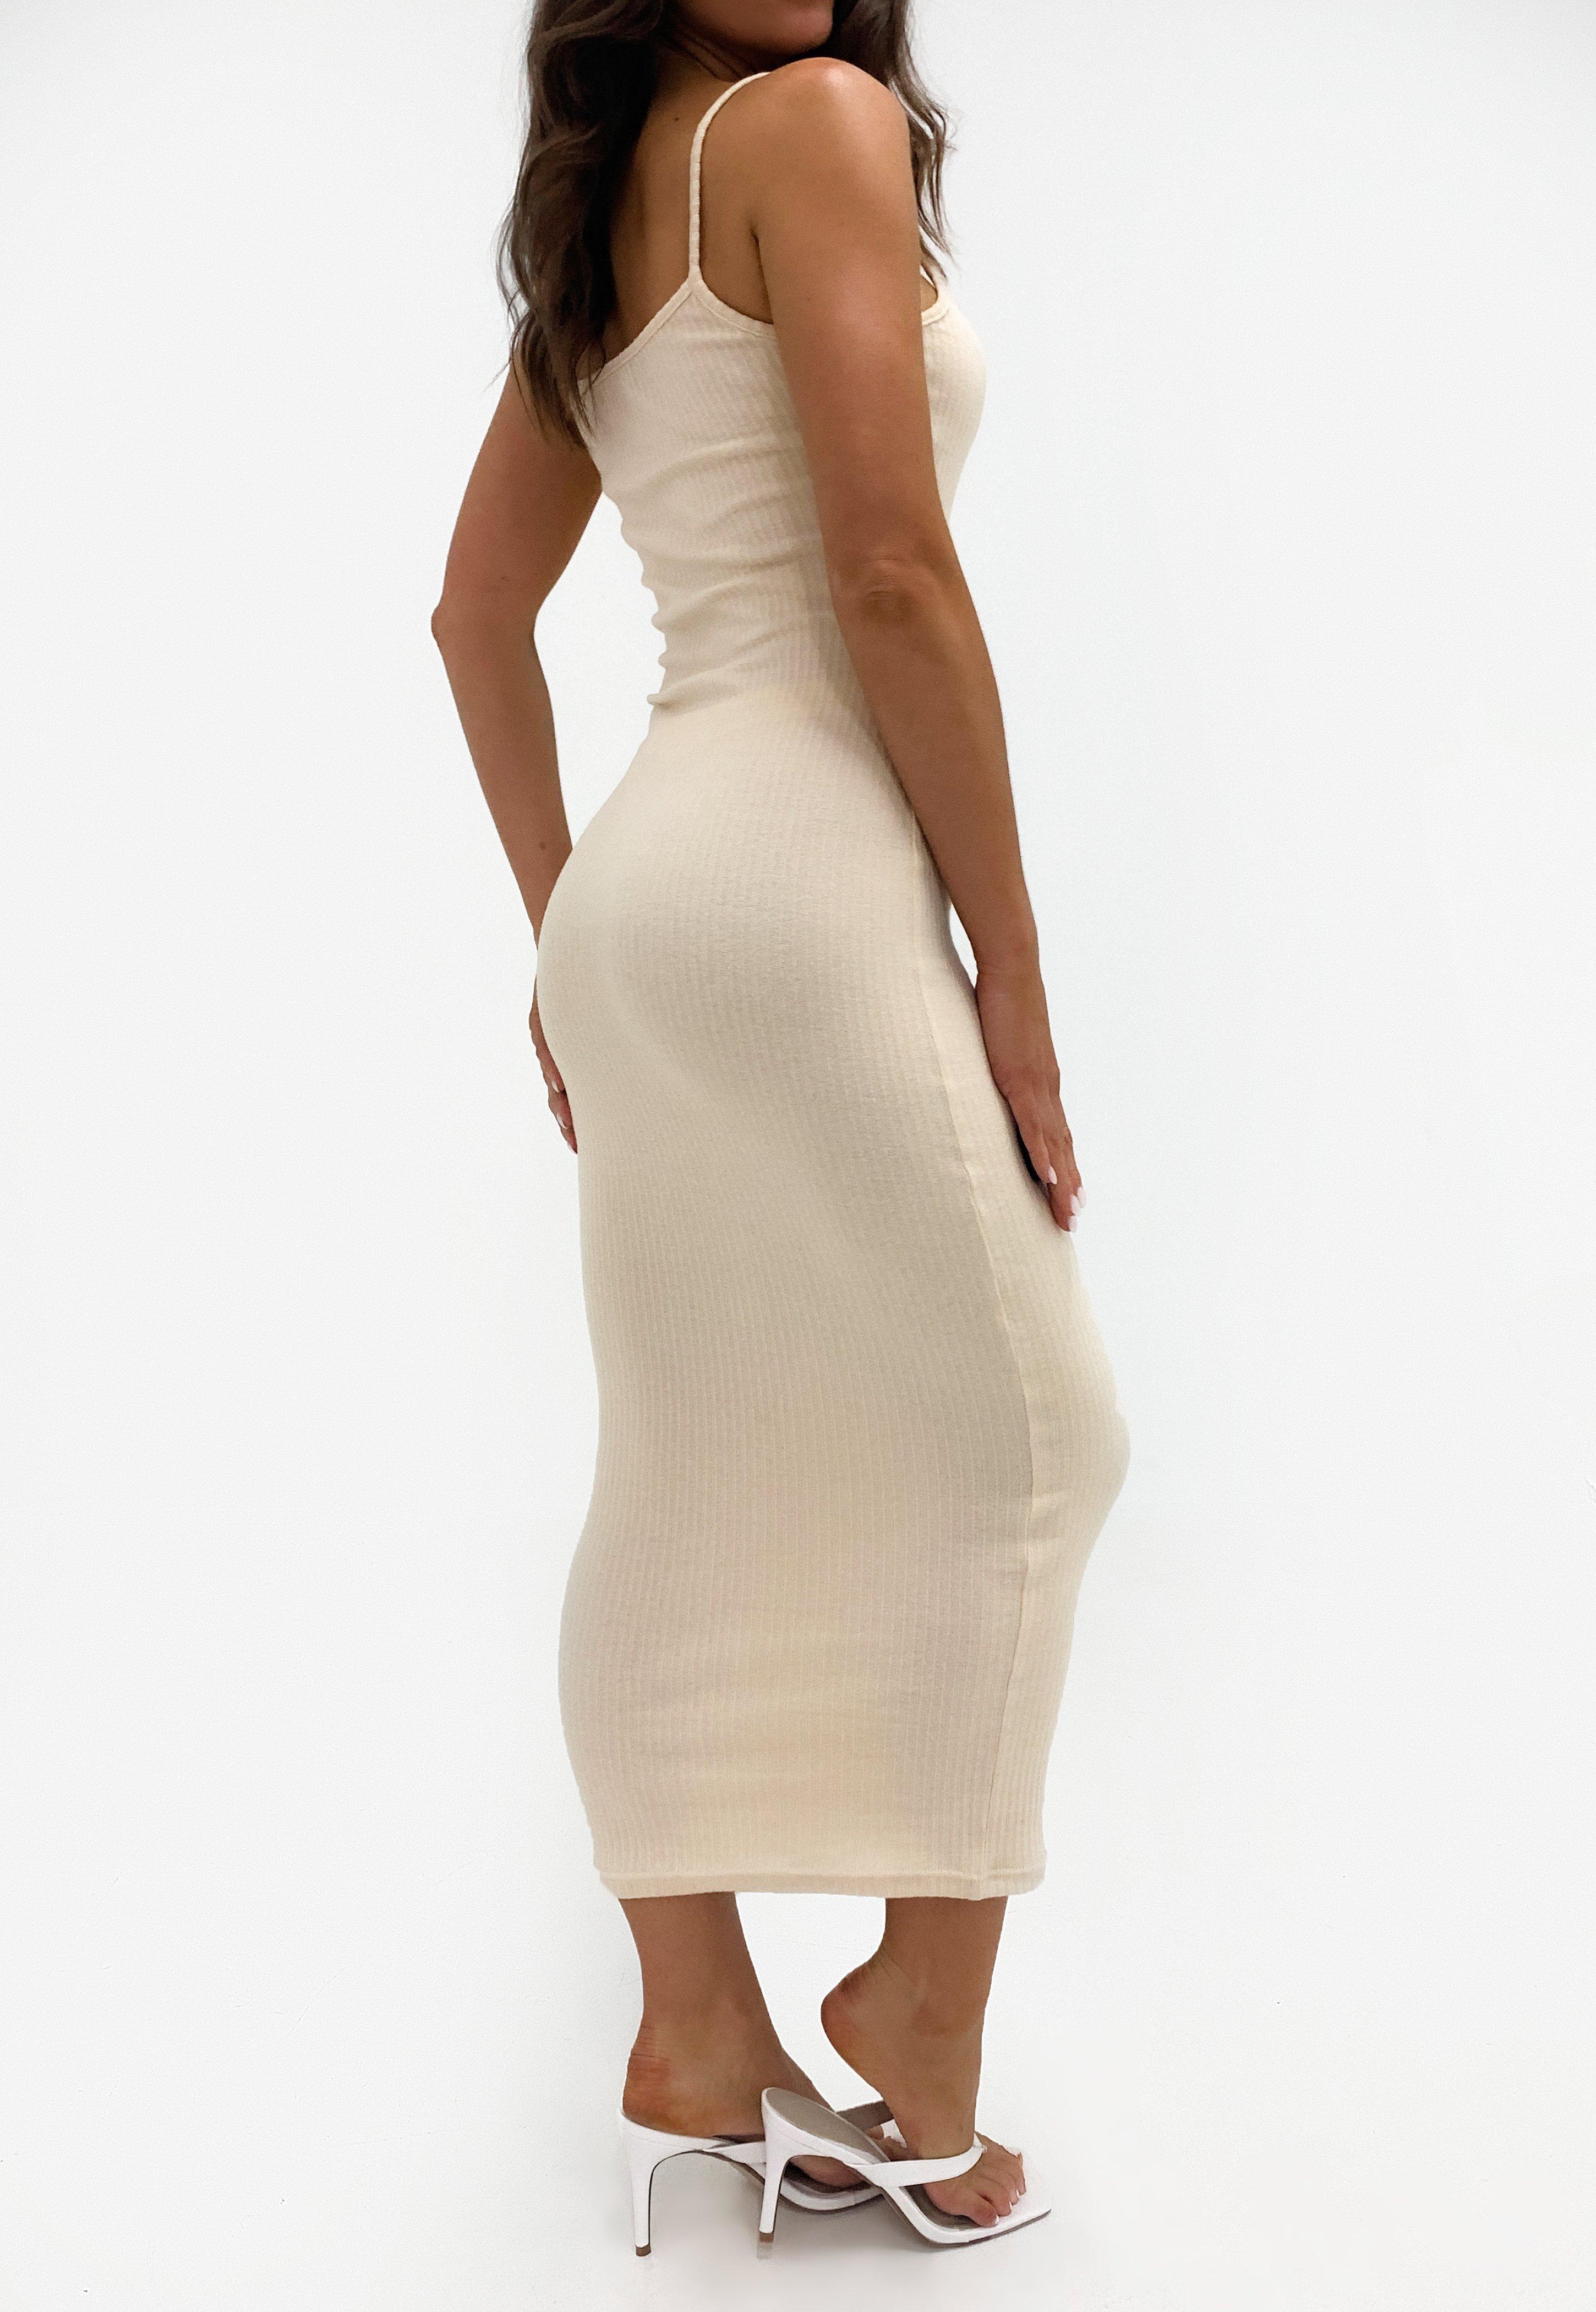 Missguided Sand Rib Strappy Midi Dress Strappy Midi Dress Midi Dress Cami Midi Dress [ 4200 x 2900 Pixel ]